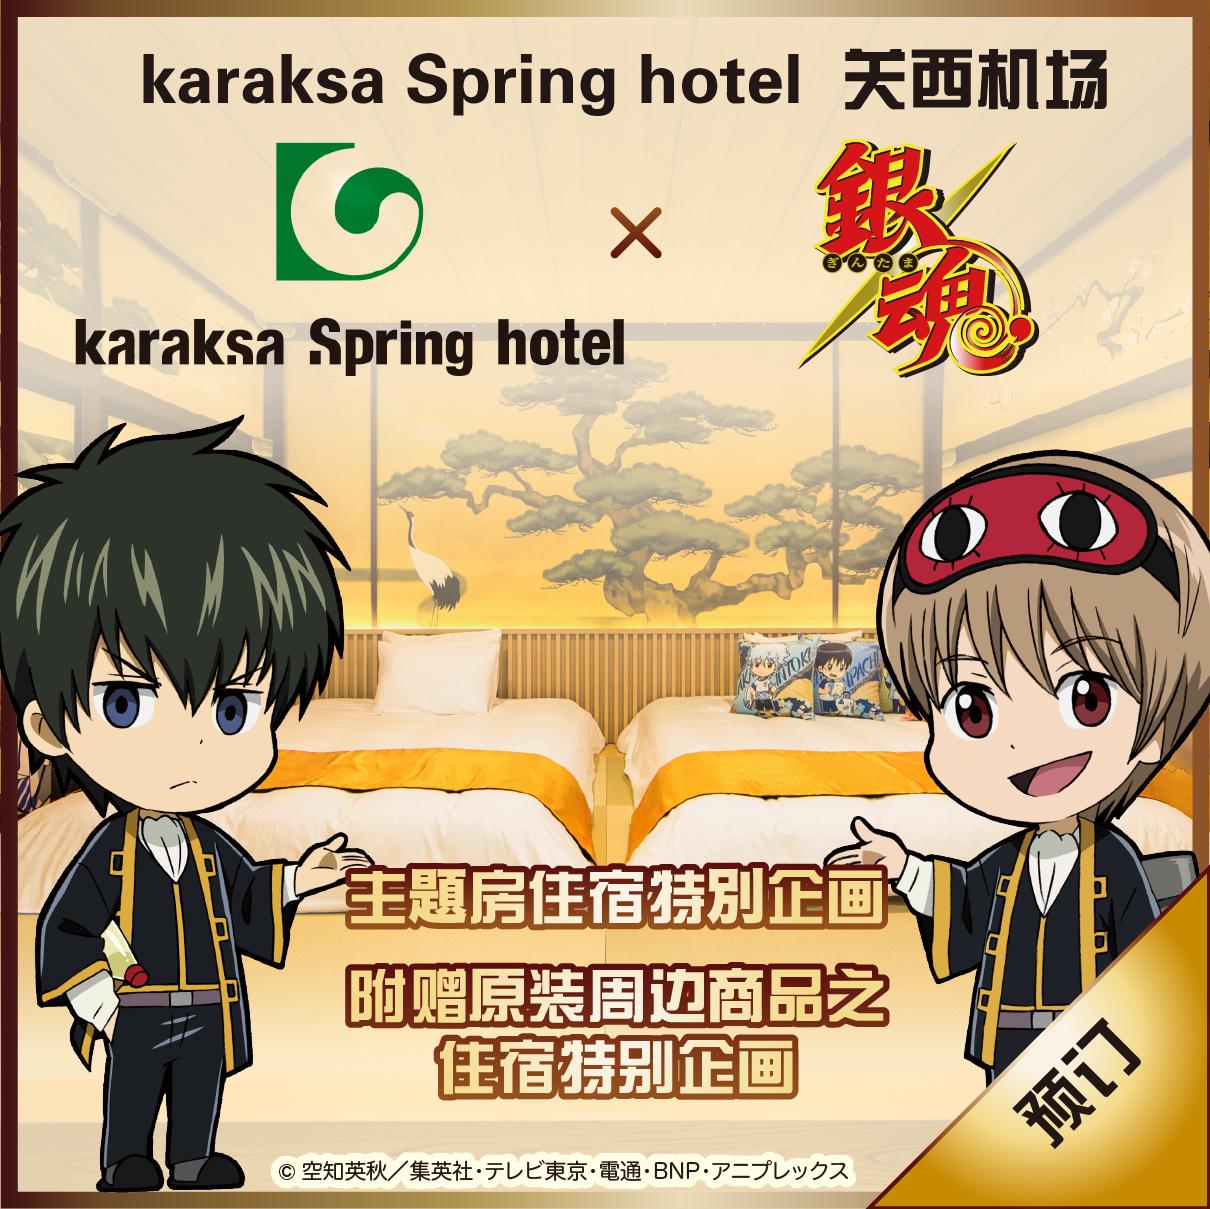 karaksa Spring hotel 关西机场独家体验「银魂」主題房住宿特別企画